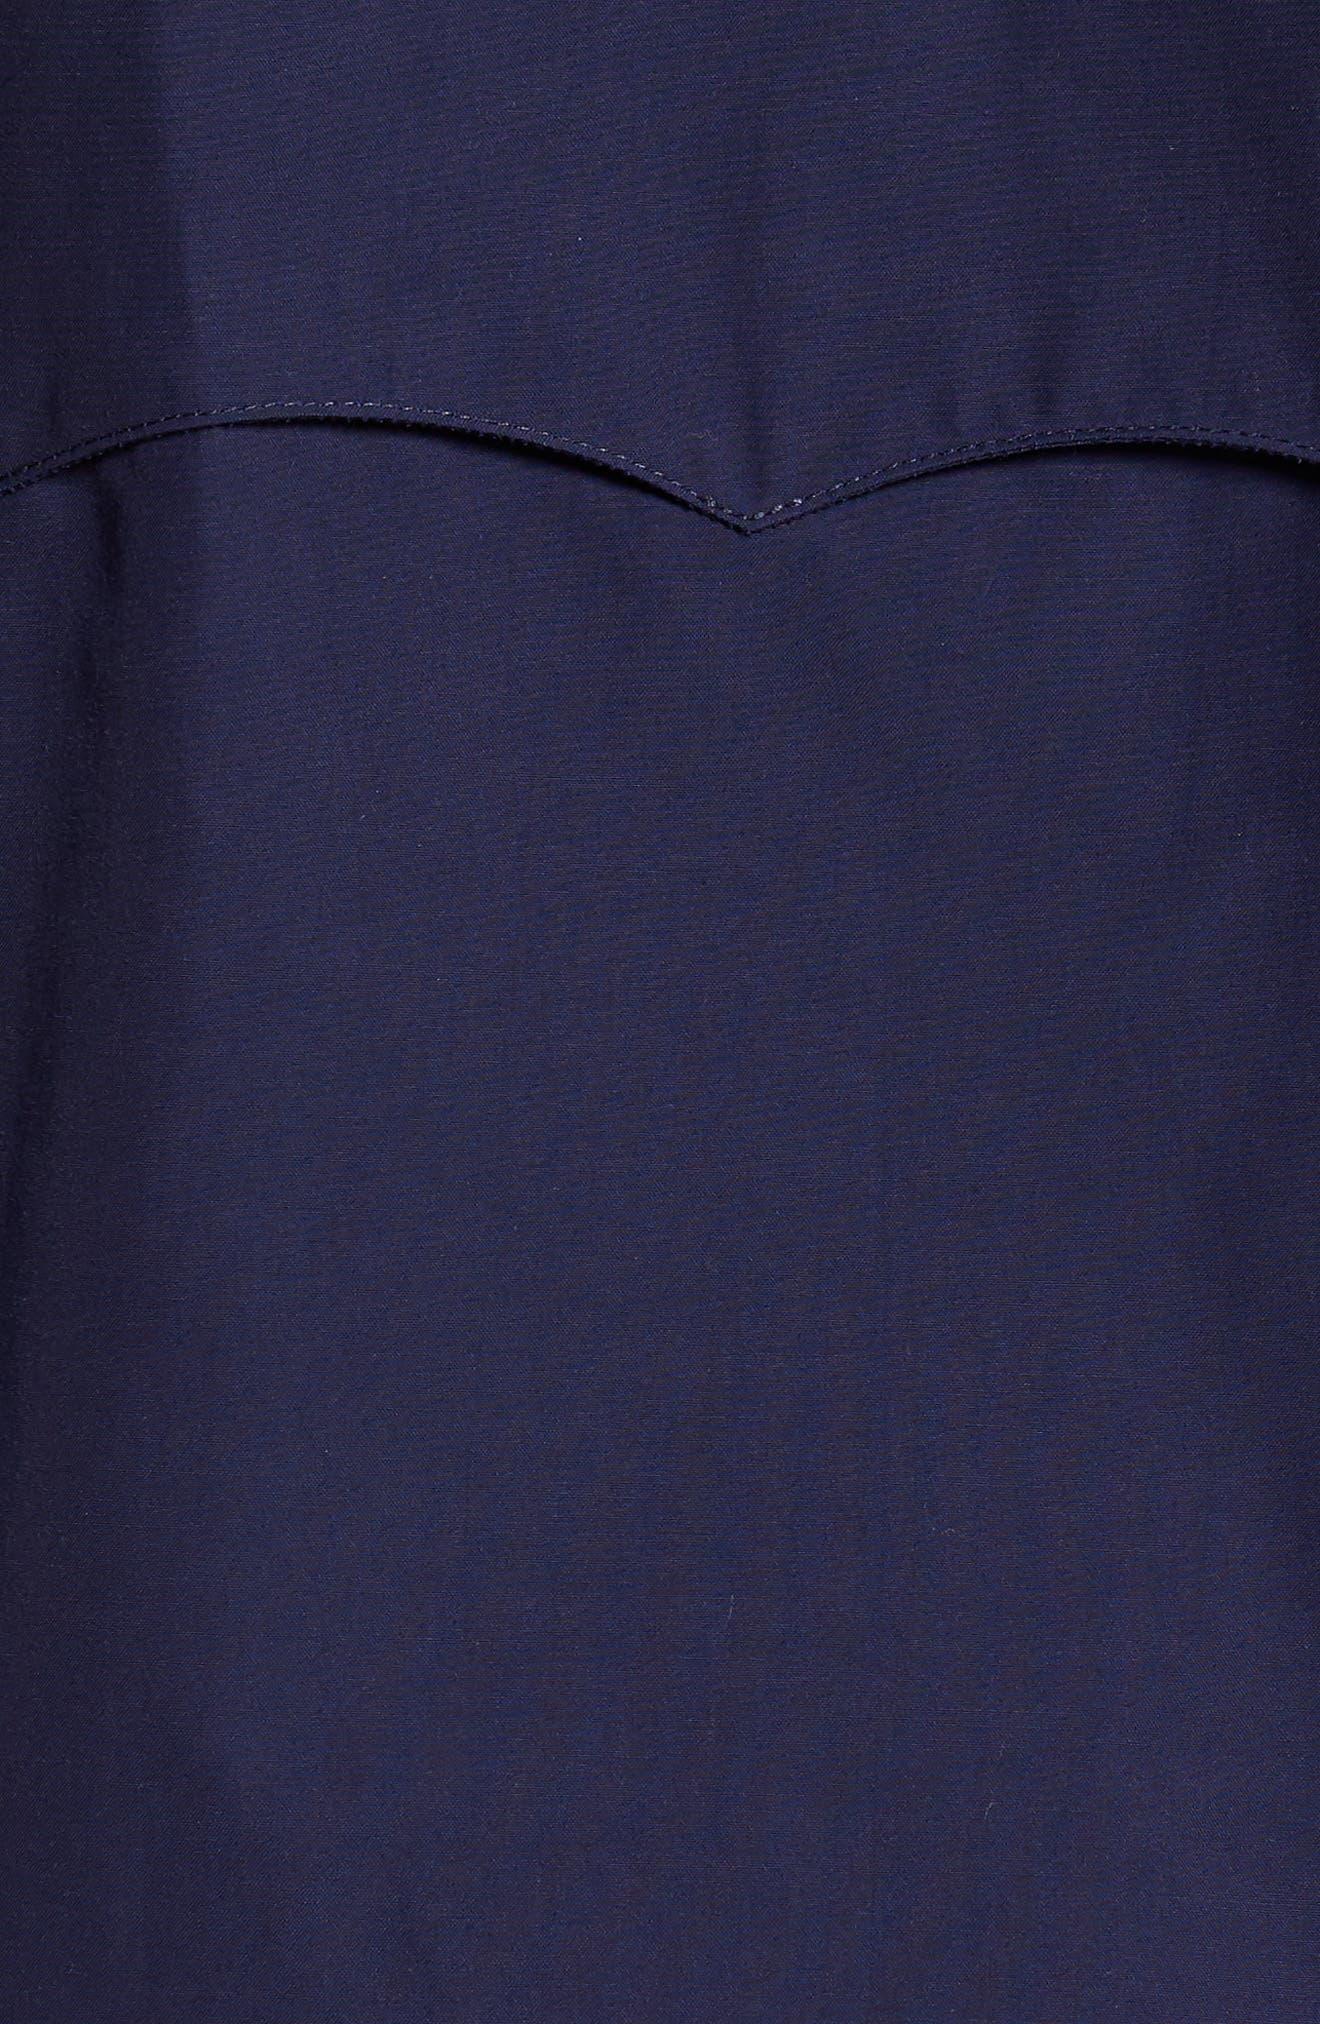 G9 Water Repellent Harrington Jacket,                             Alternate thumbnail 6, color,                             Indigo